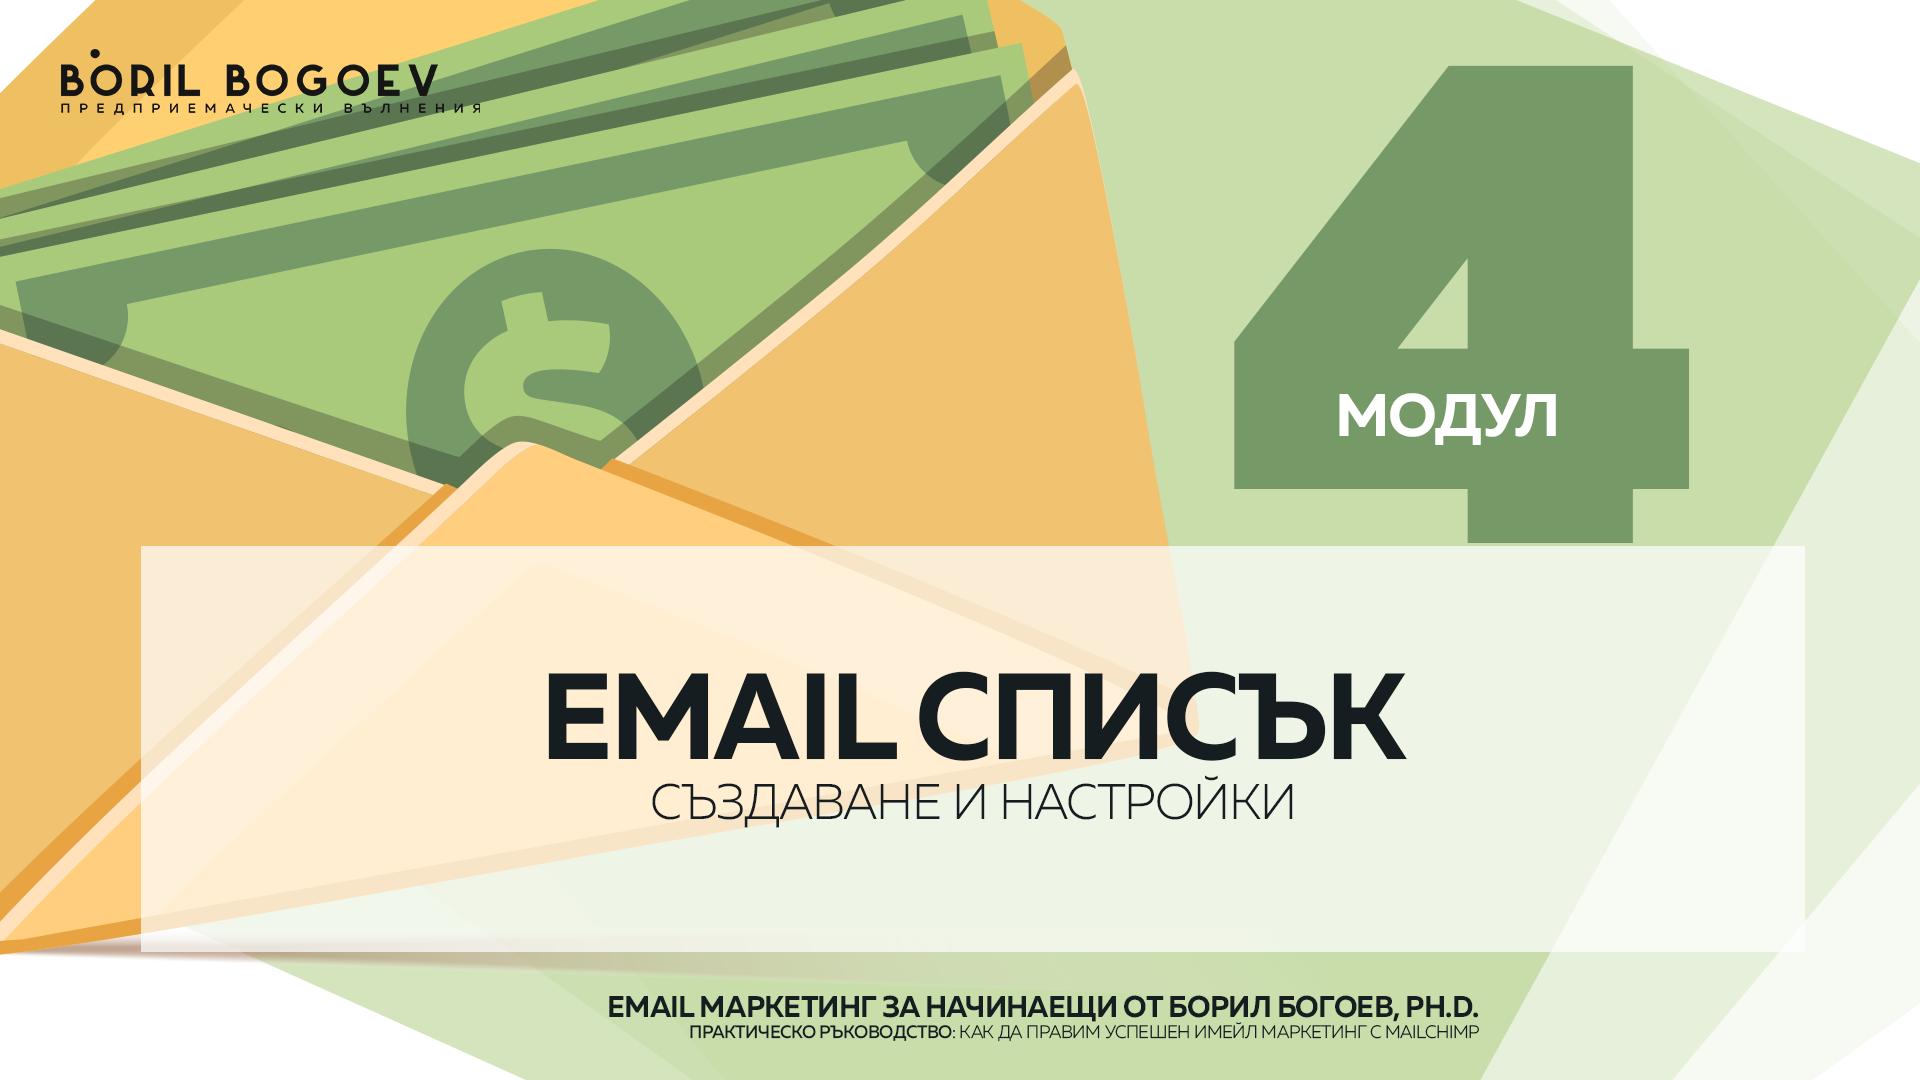 emb-presentation-m4